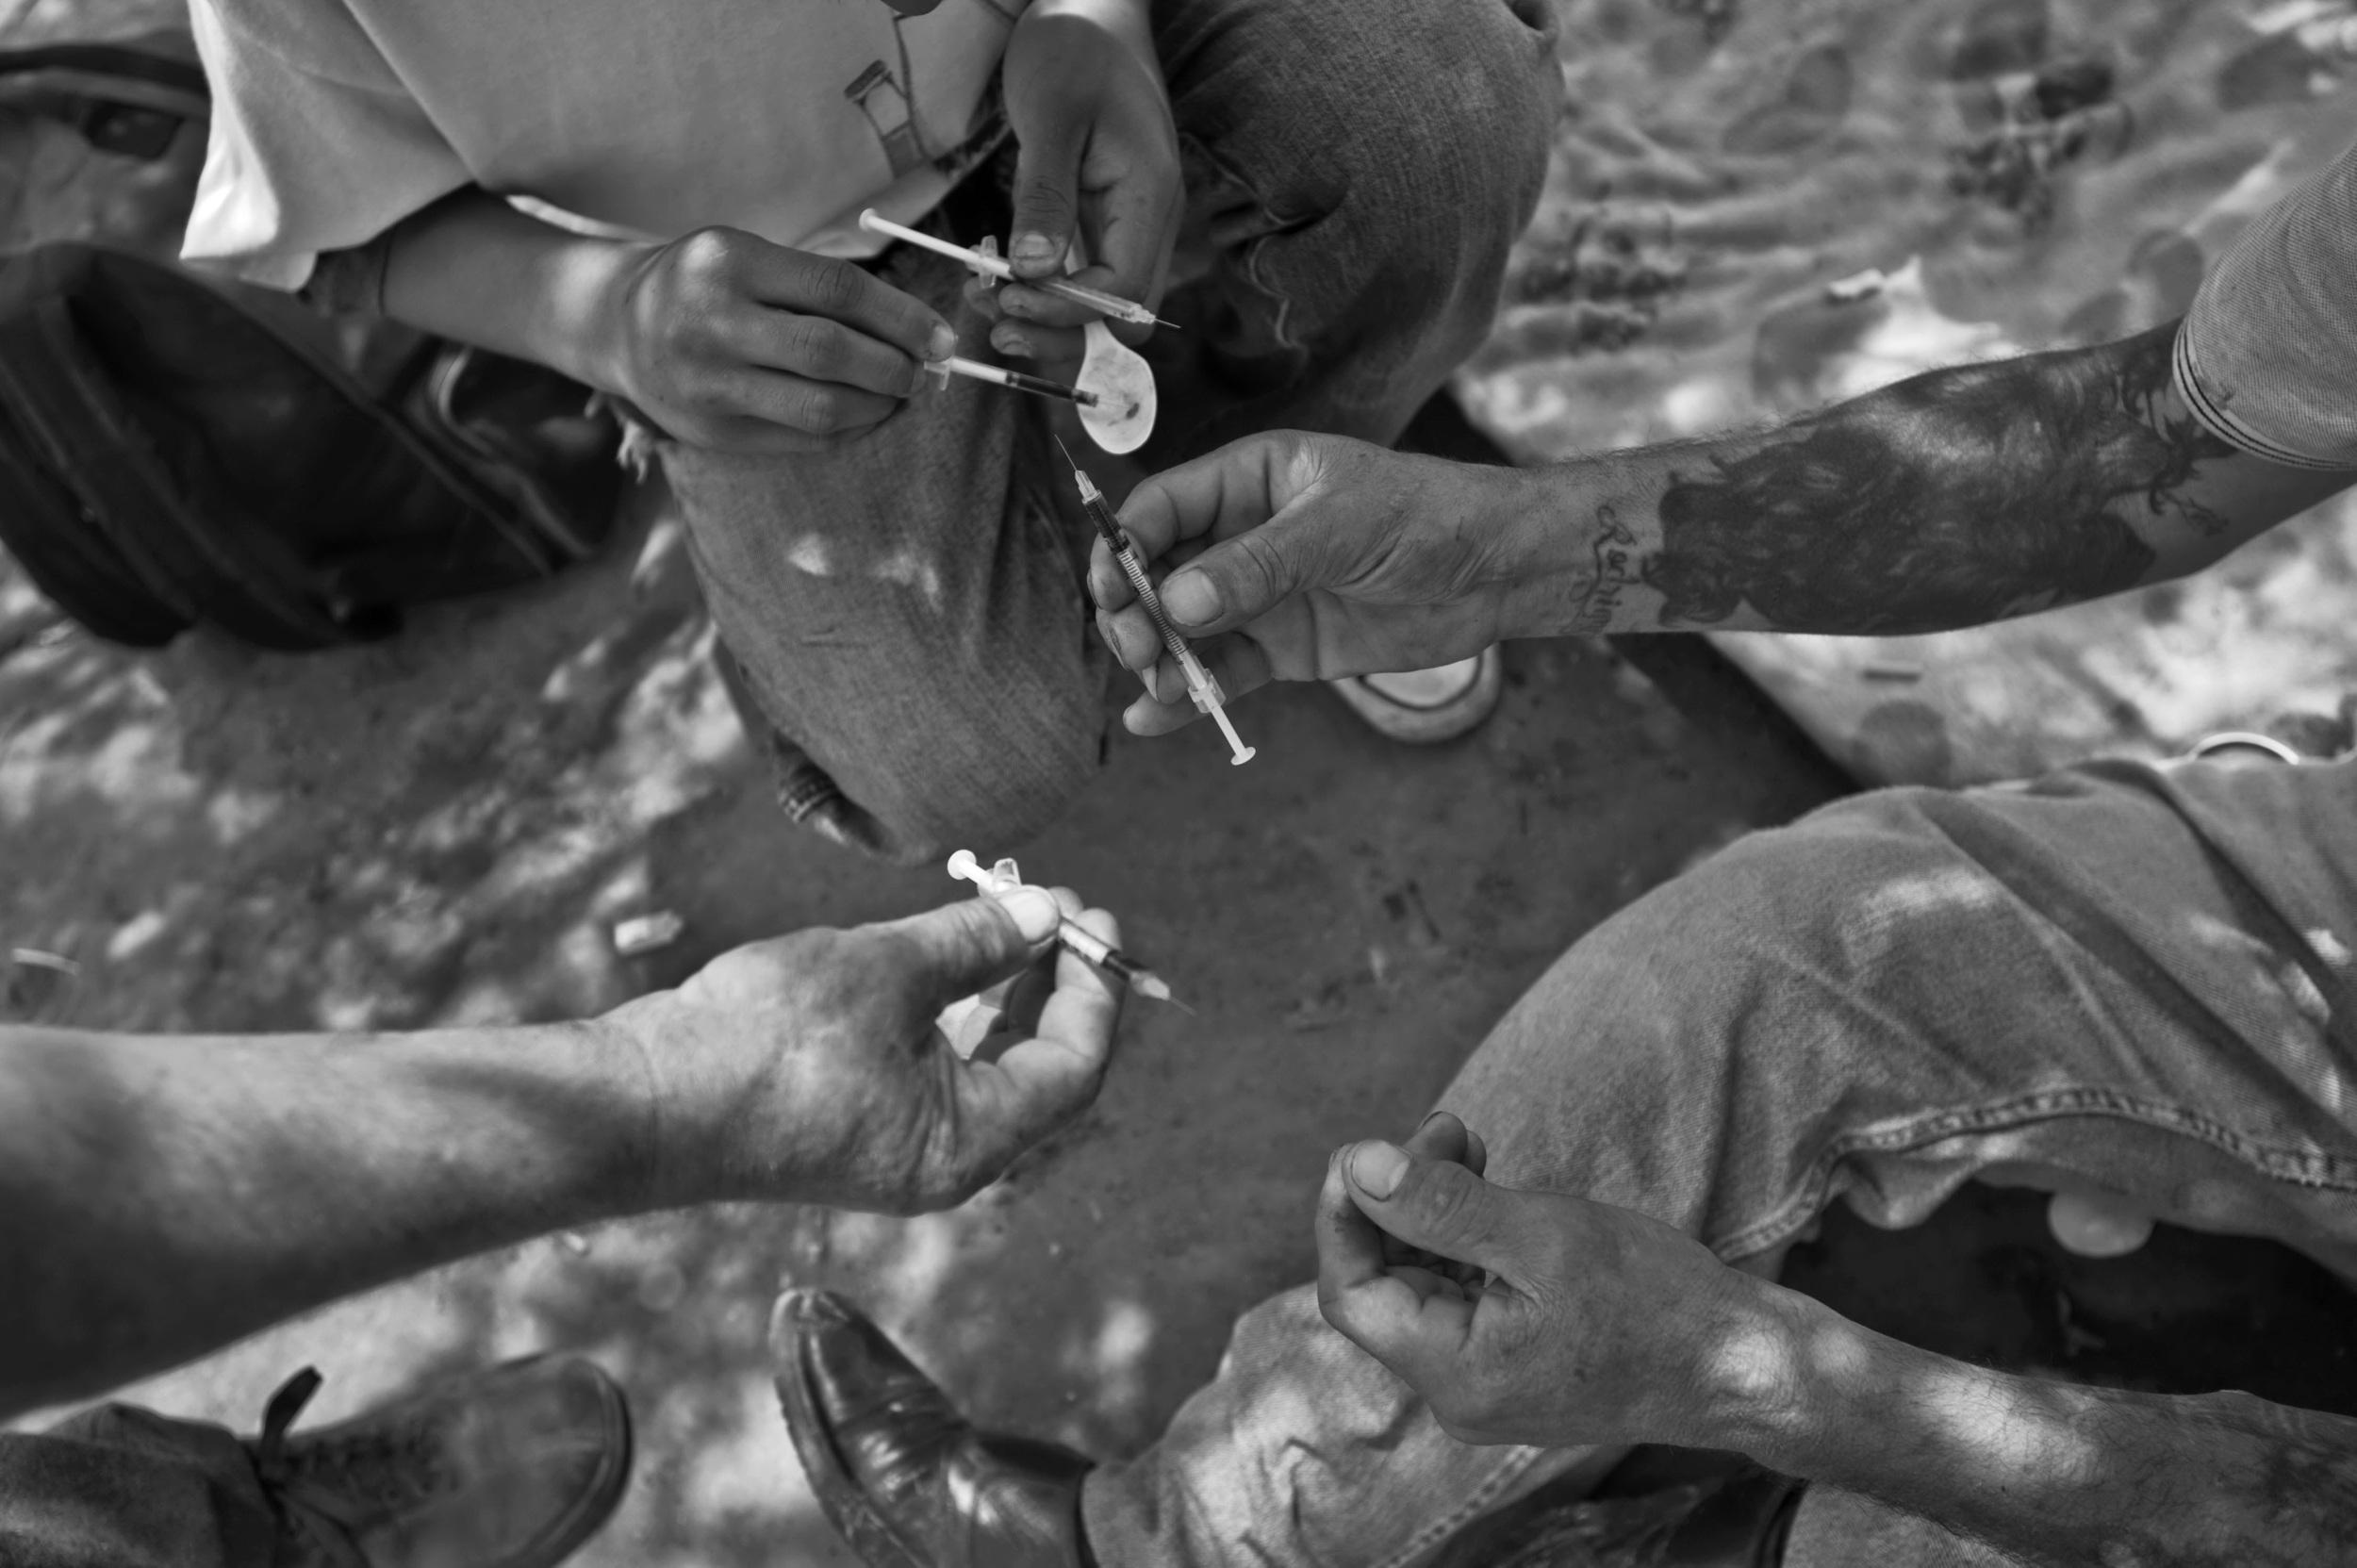 Mexican heroin addicts prepare needles along the Tijuana River in Mexico. ©Louie Palu/ZUMAPRESS.com